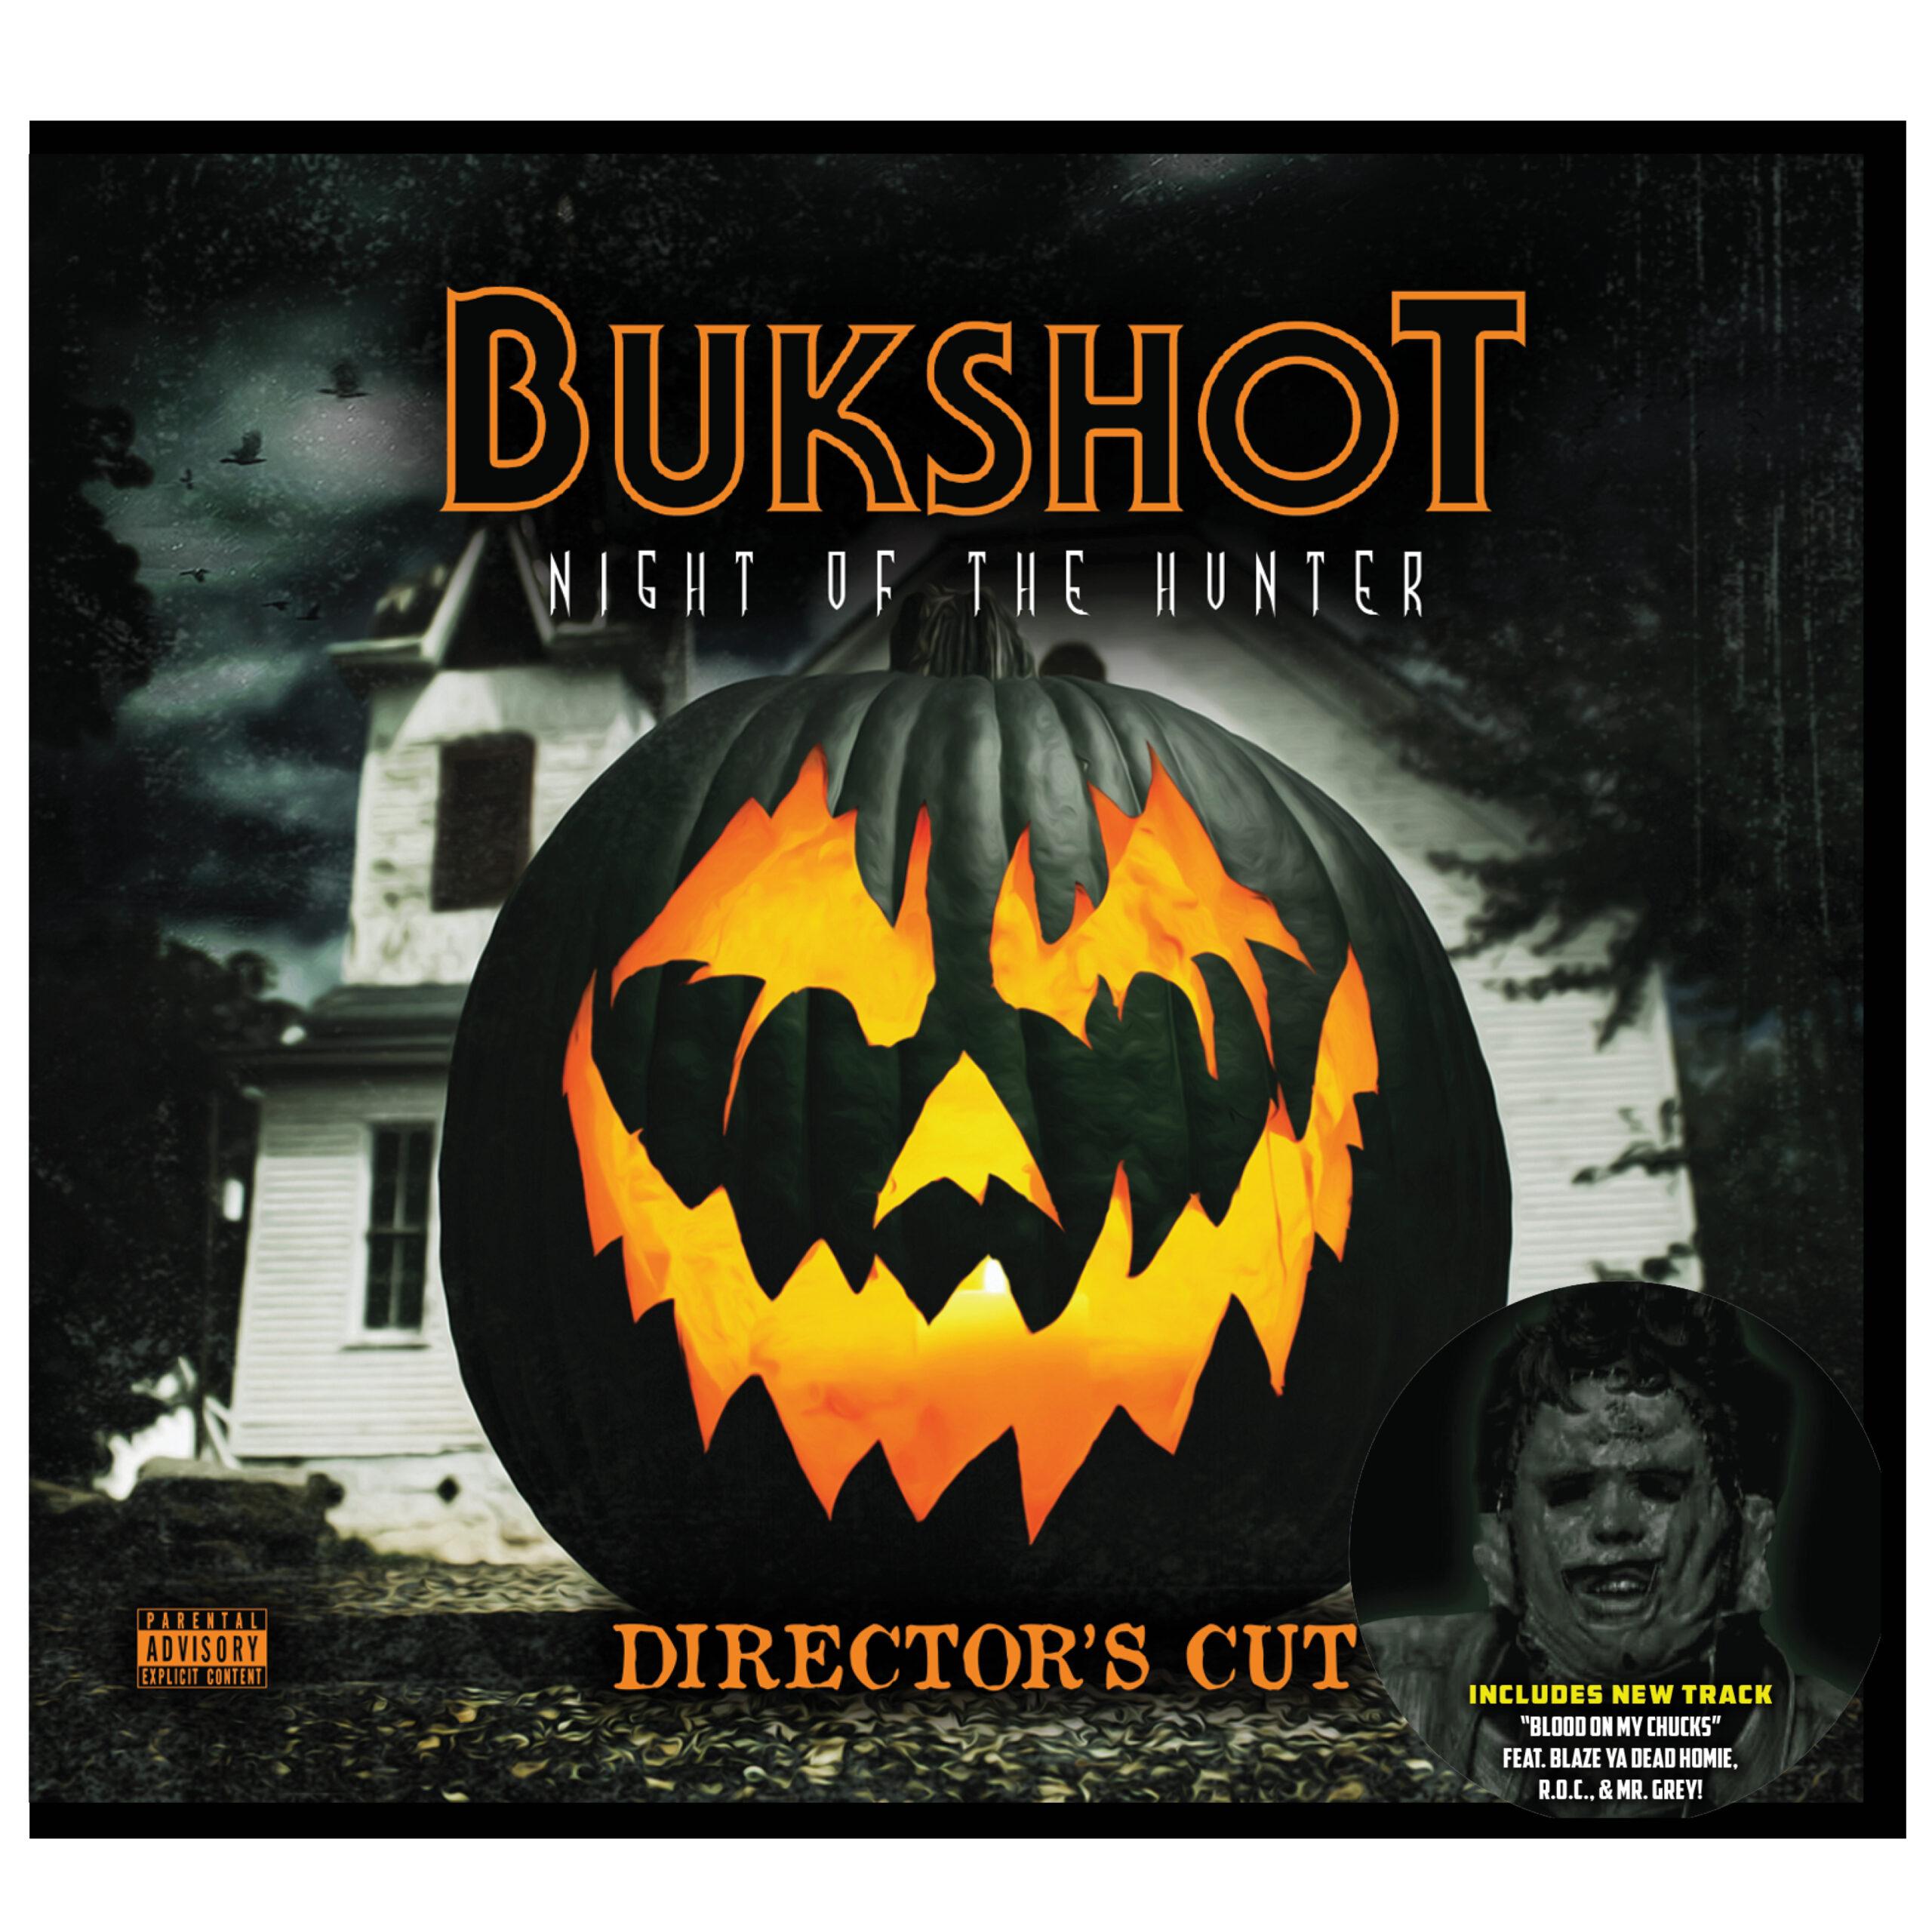 "Bukshot ""Night Of The Hunter"" Director's Cut CD! Includes BRAND NEW Bonus Track!"